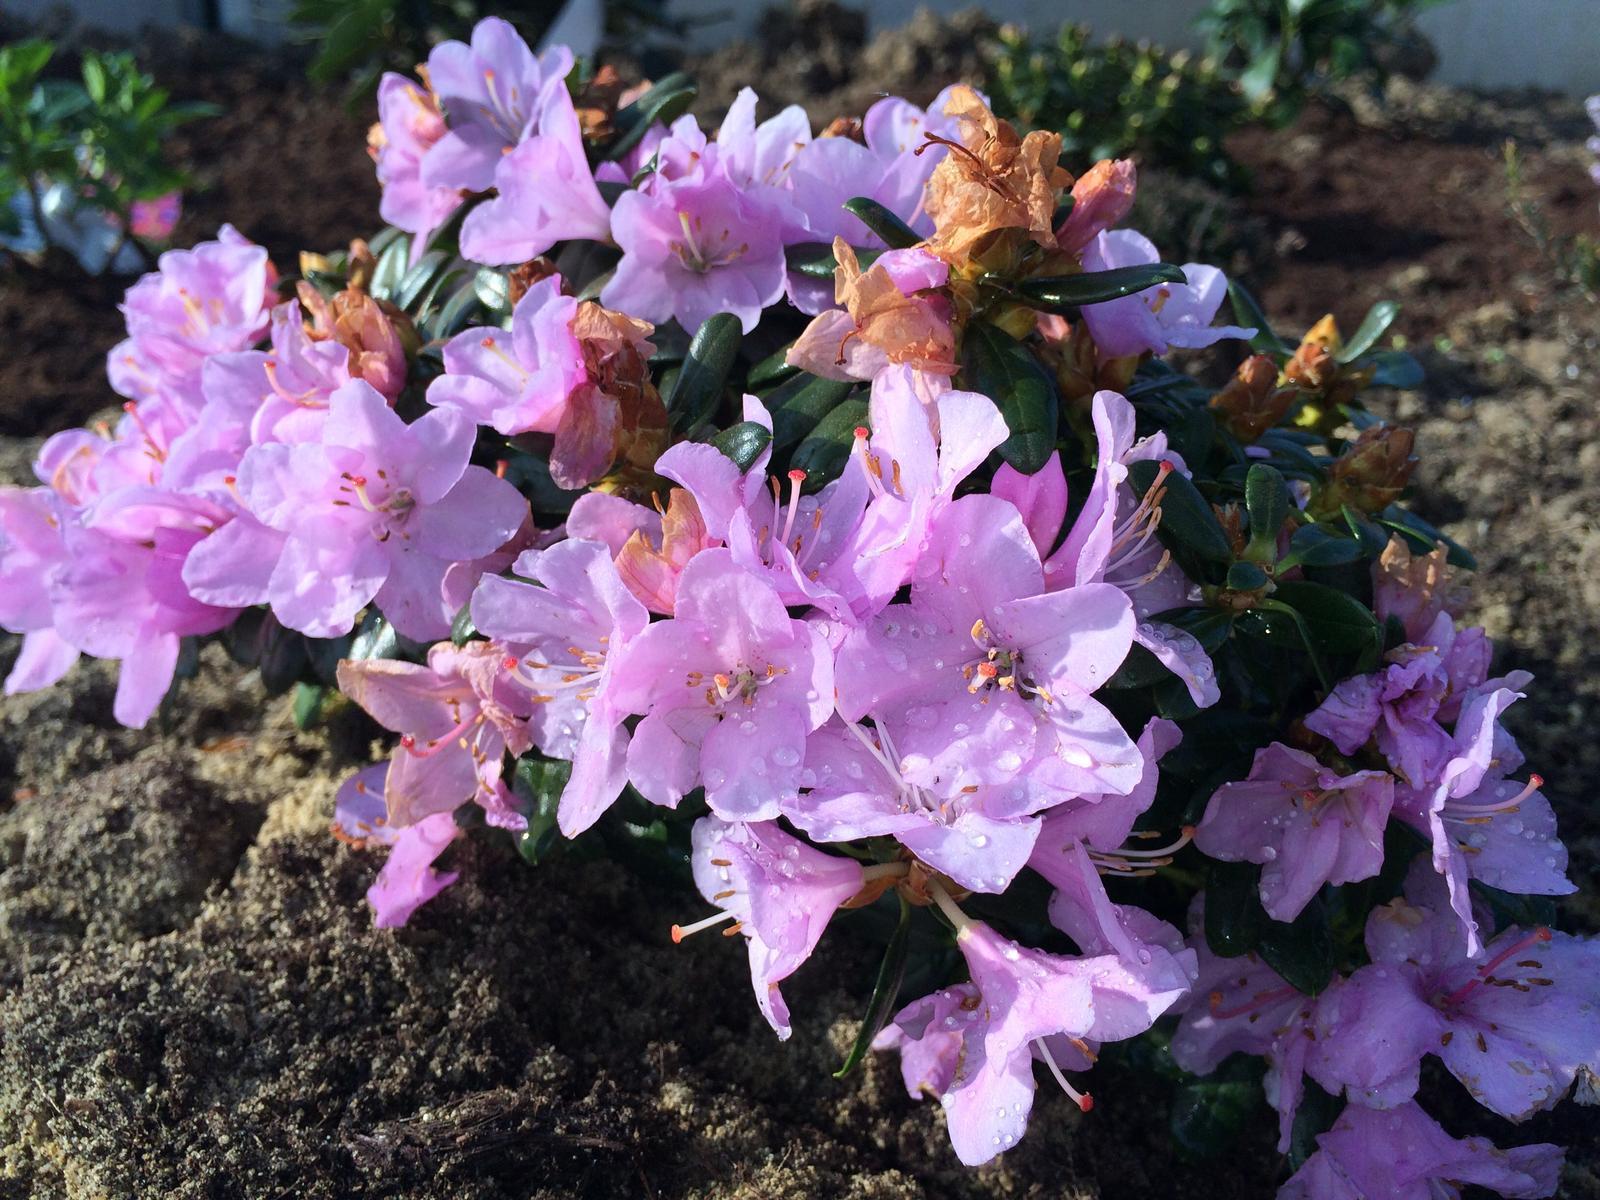 Zahradka nasa 2015 - zakrsly rododendron, krasne kvete :)